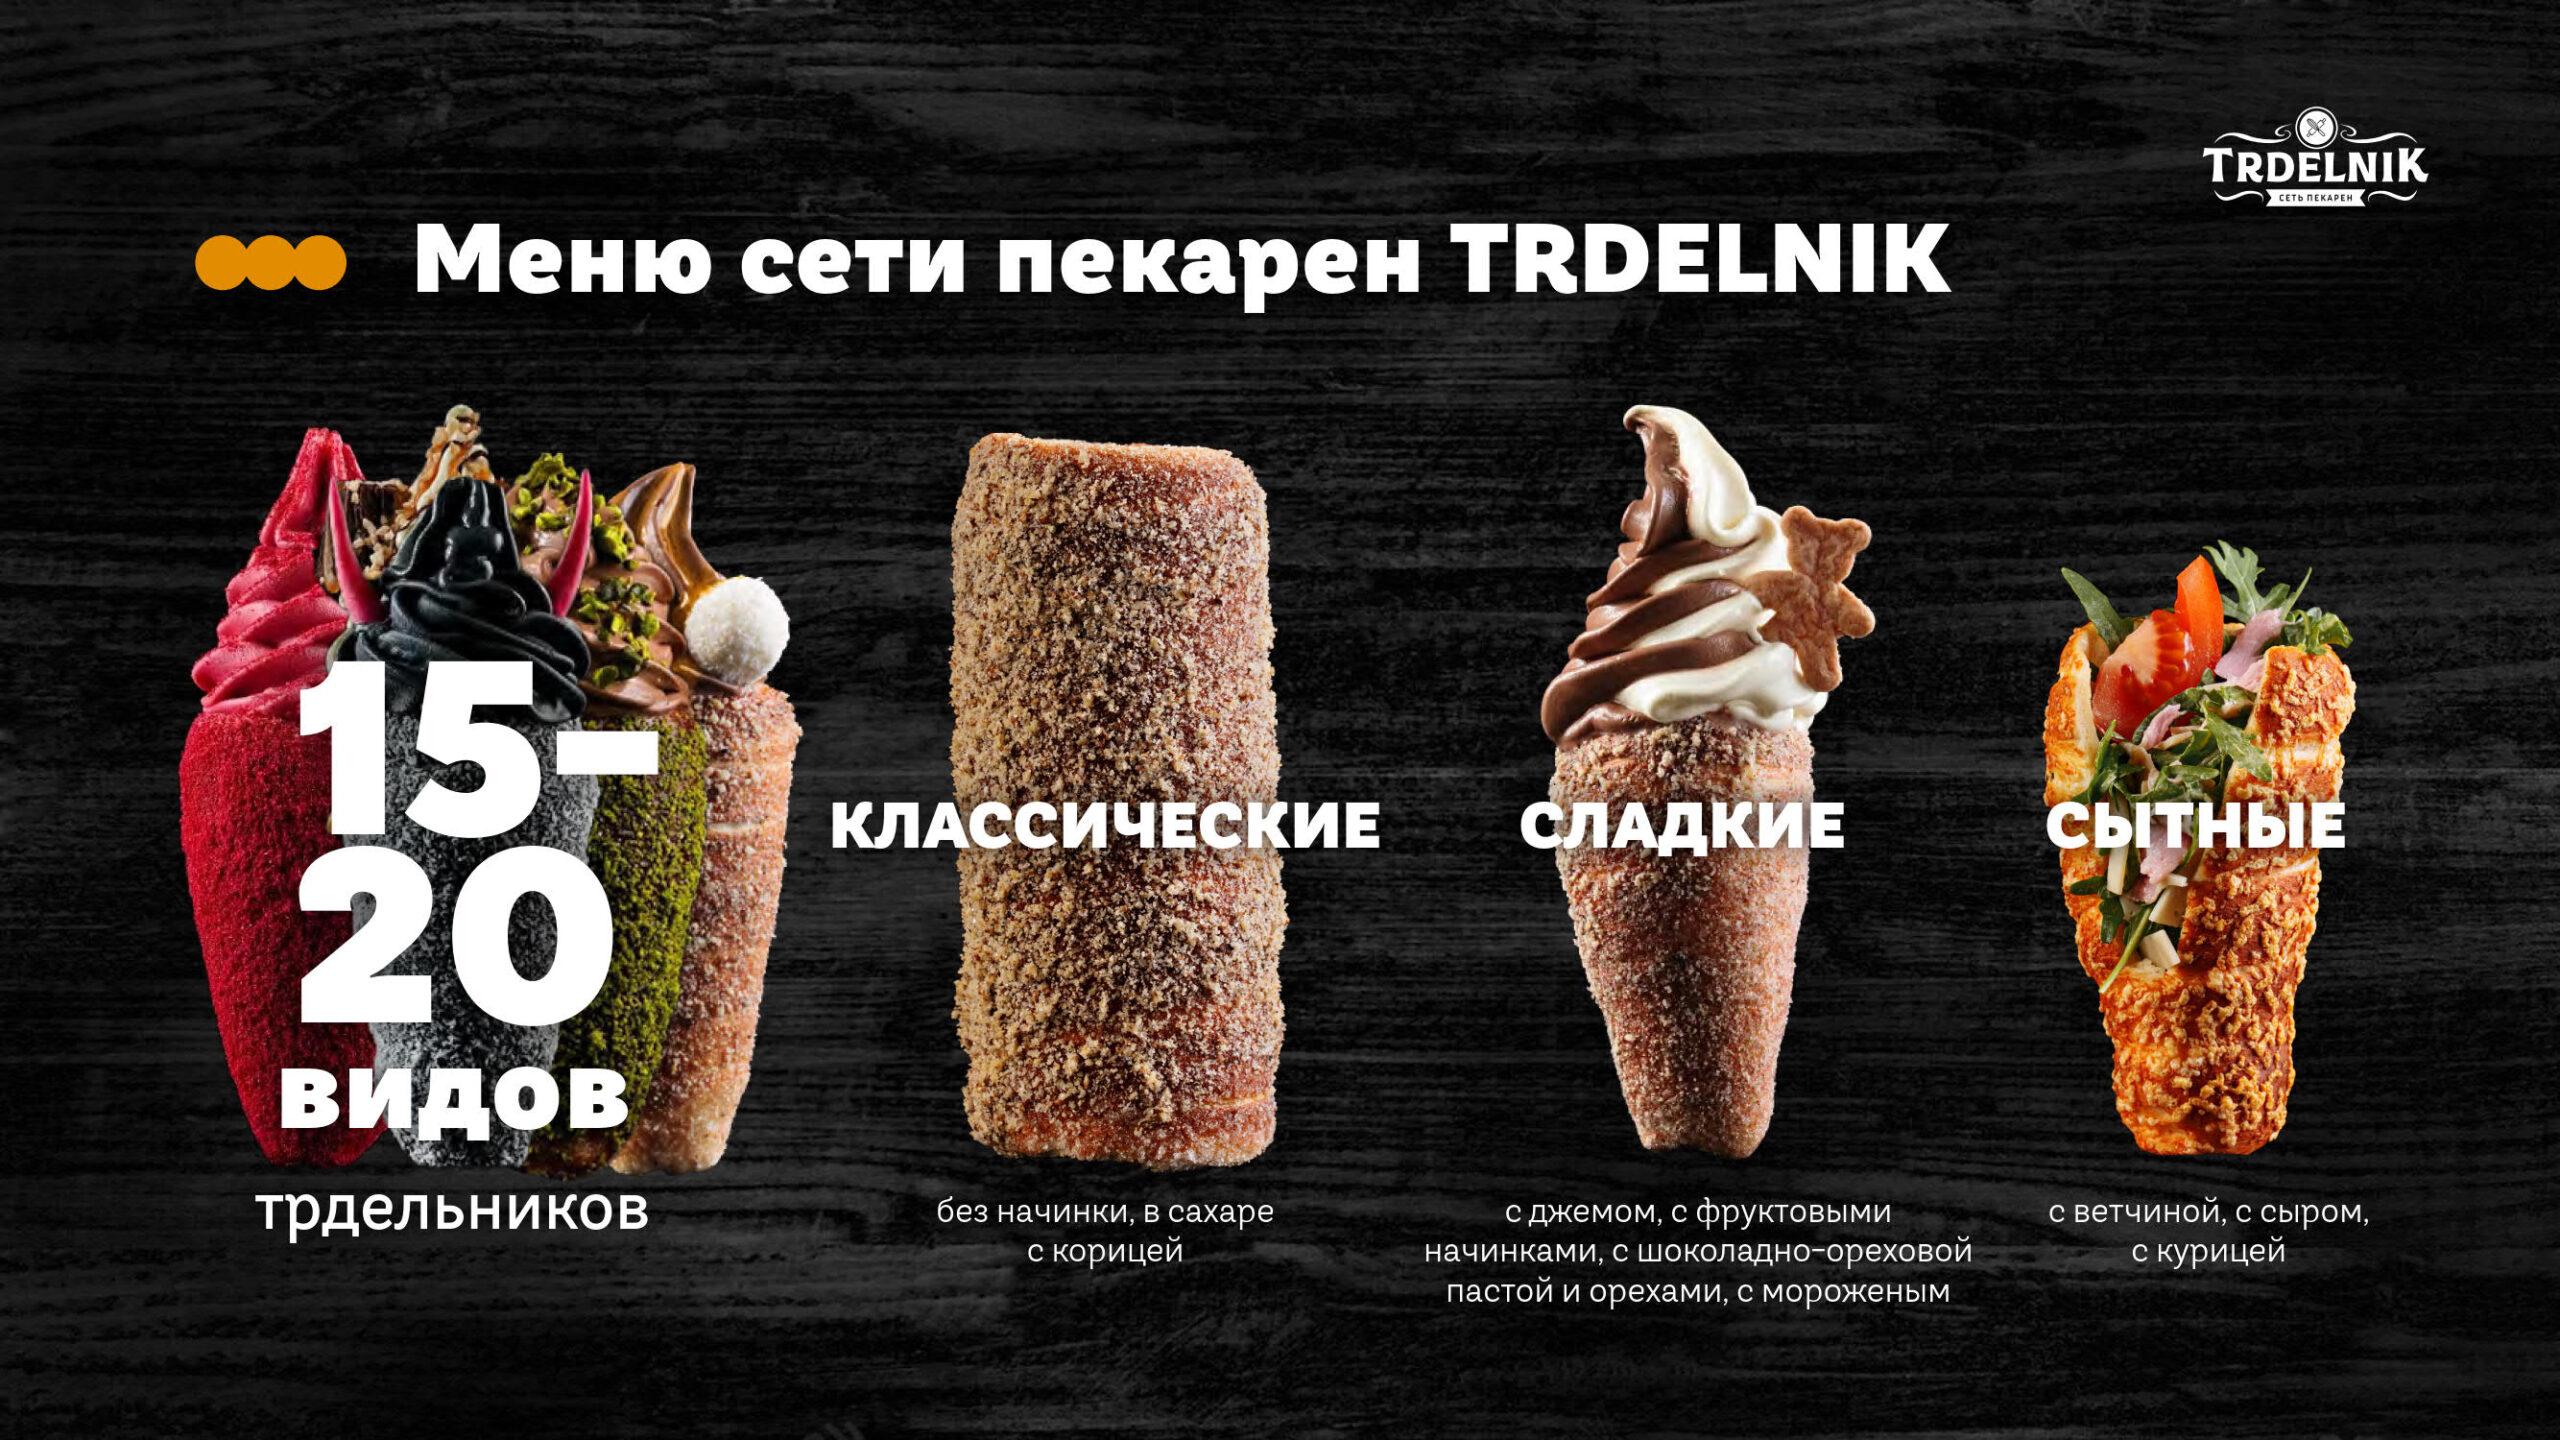 Презентация сети пекарен Trdelnik для арендодателя